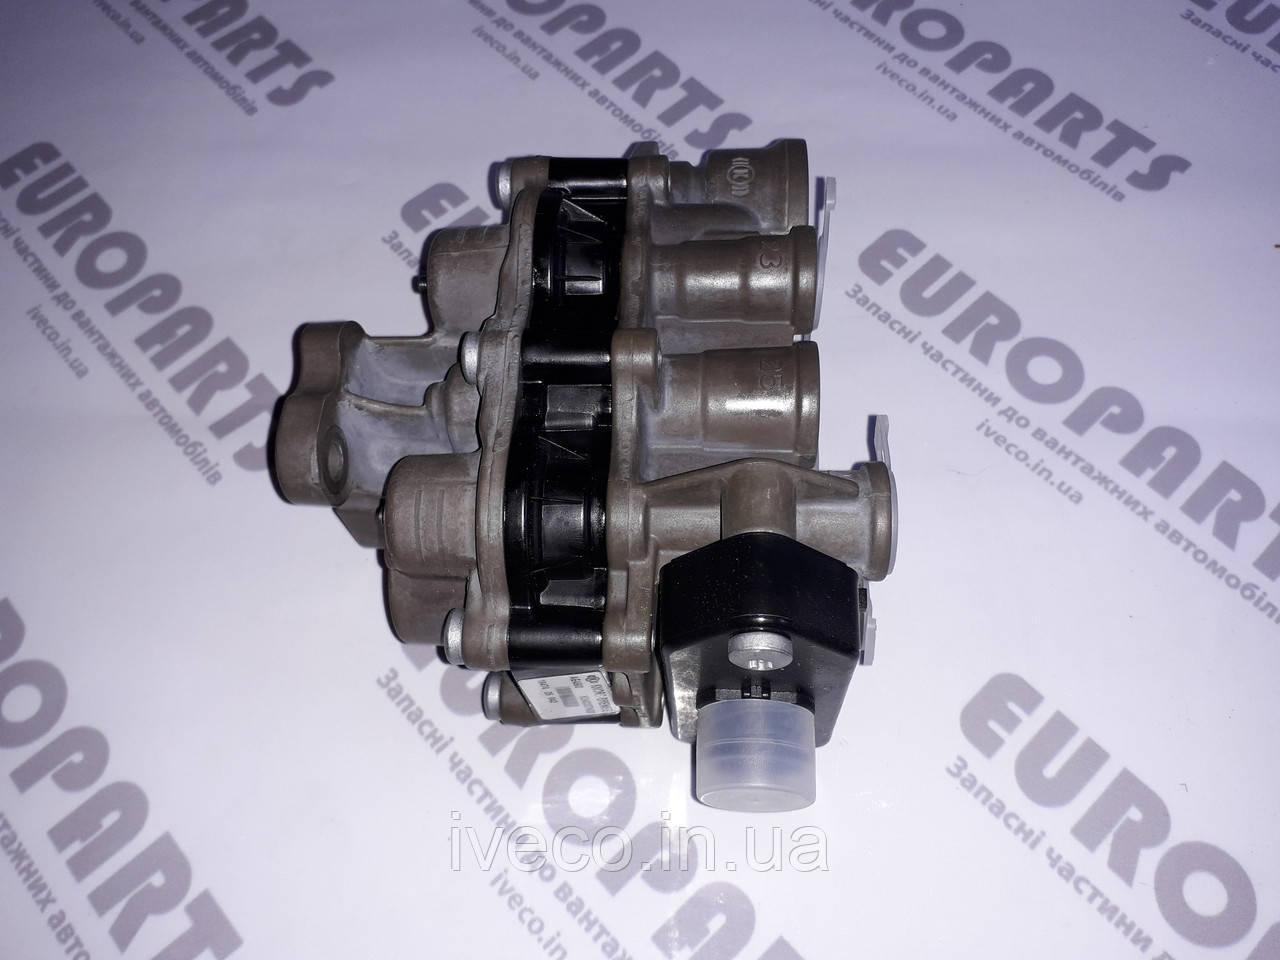 Кран защитный четырехконтурный Iveco Ивеко Cursor Trakker Stralis 42553848 42553849 42535024 AE4502 AE4516